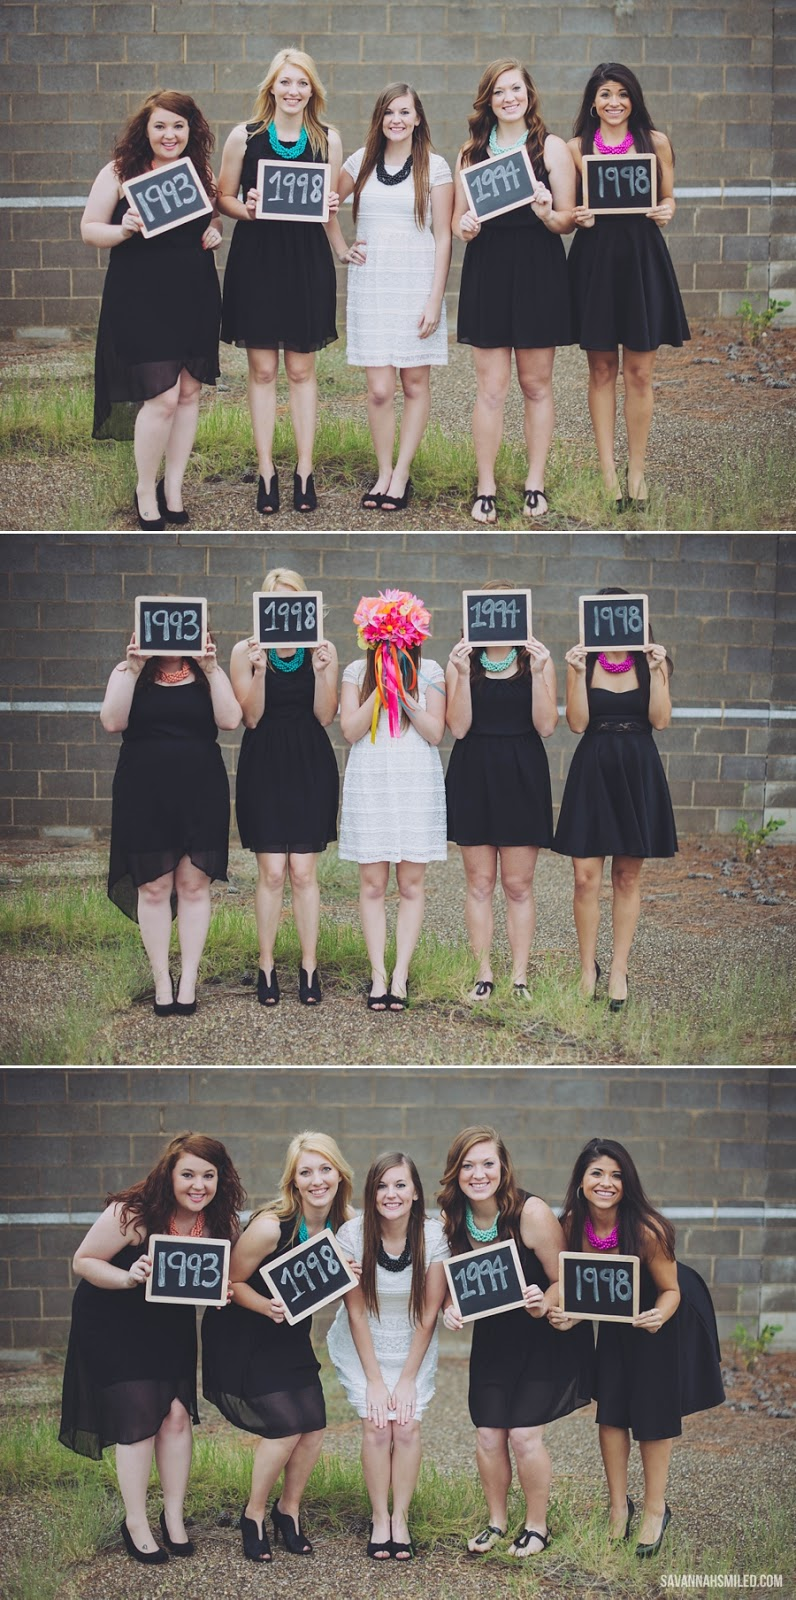 bridesmaids-photo-shoot-49.jpg